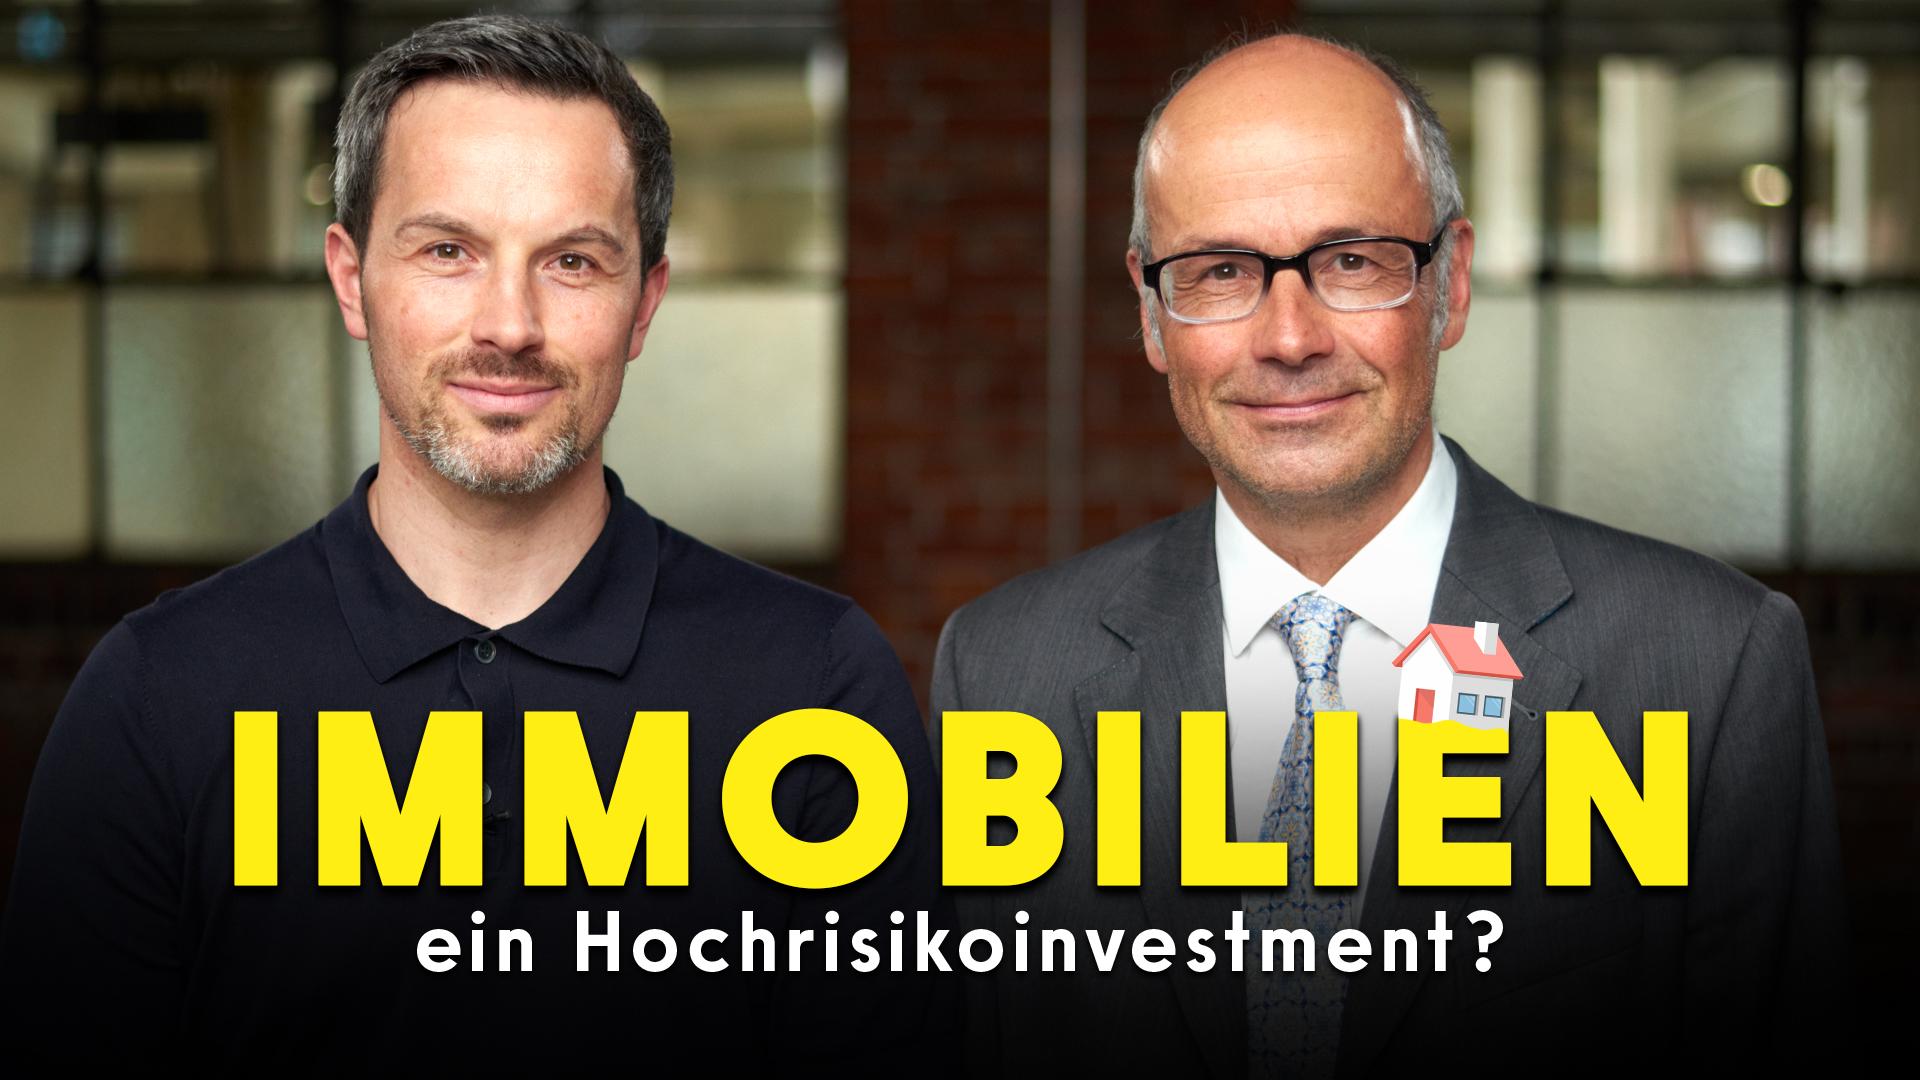 IMMOBILIENBLASE - schon bald am Ende? (Interview Dr. Andreas Beck)